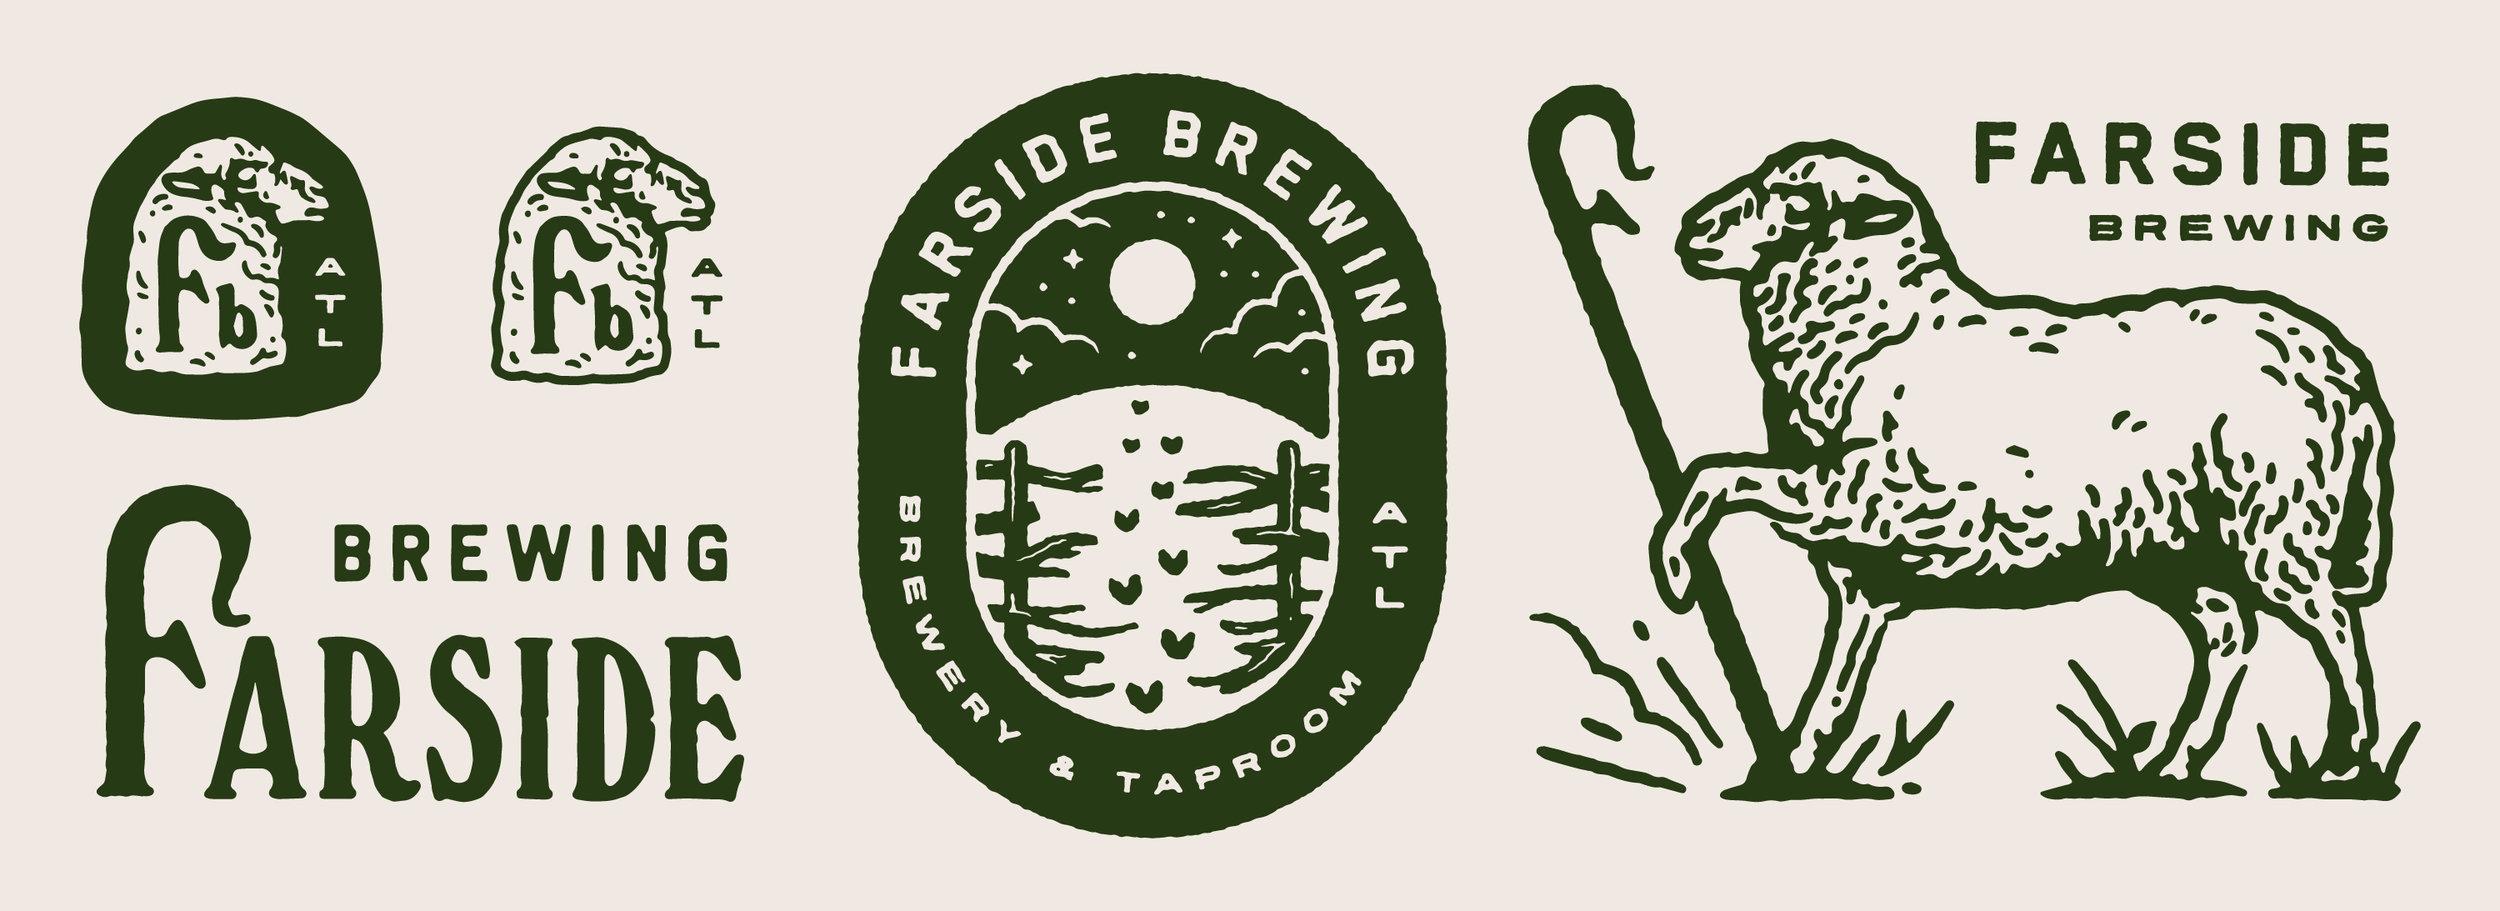 Farside Brewing Branding